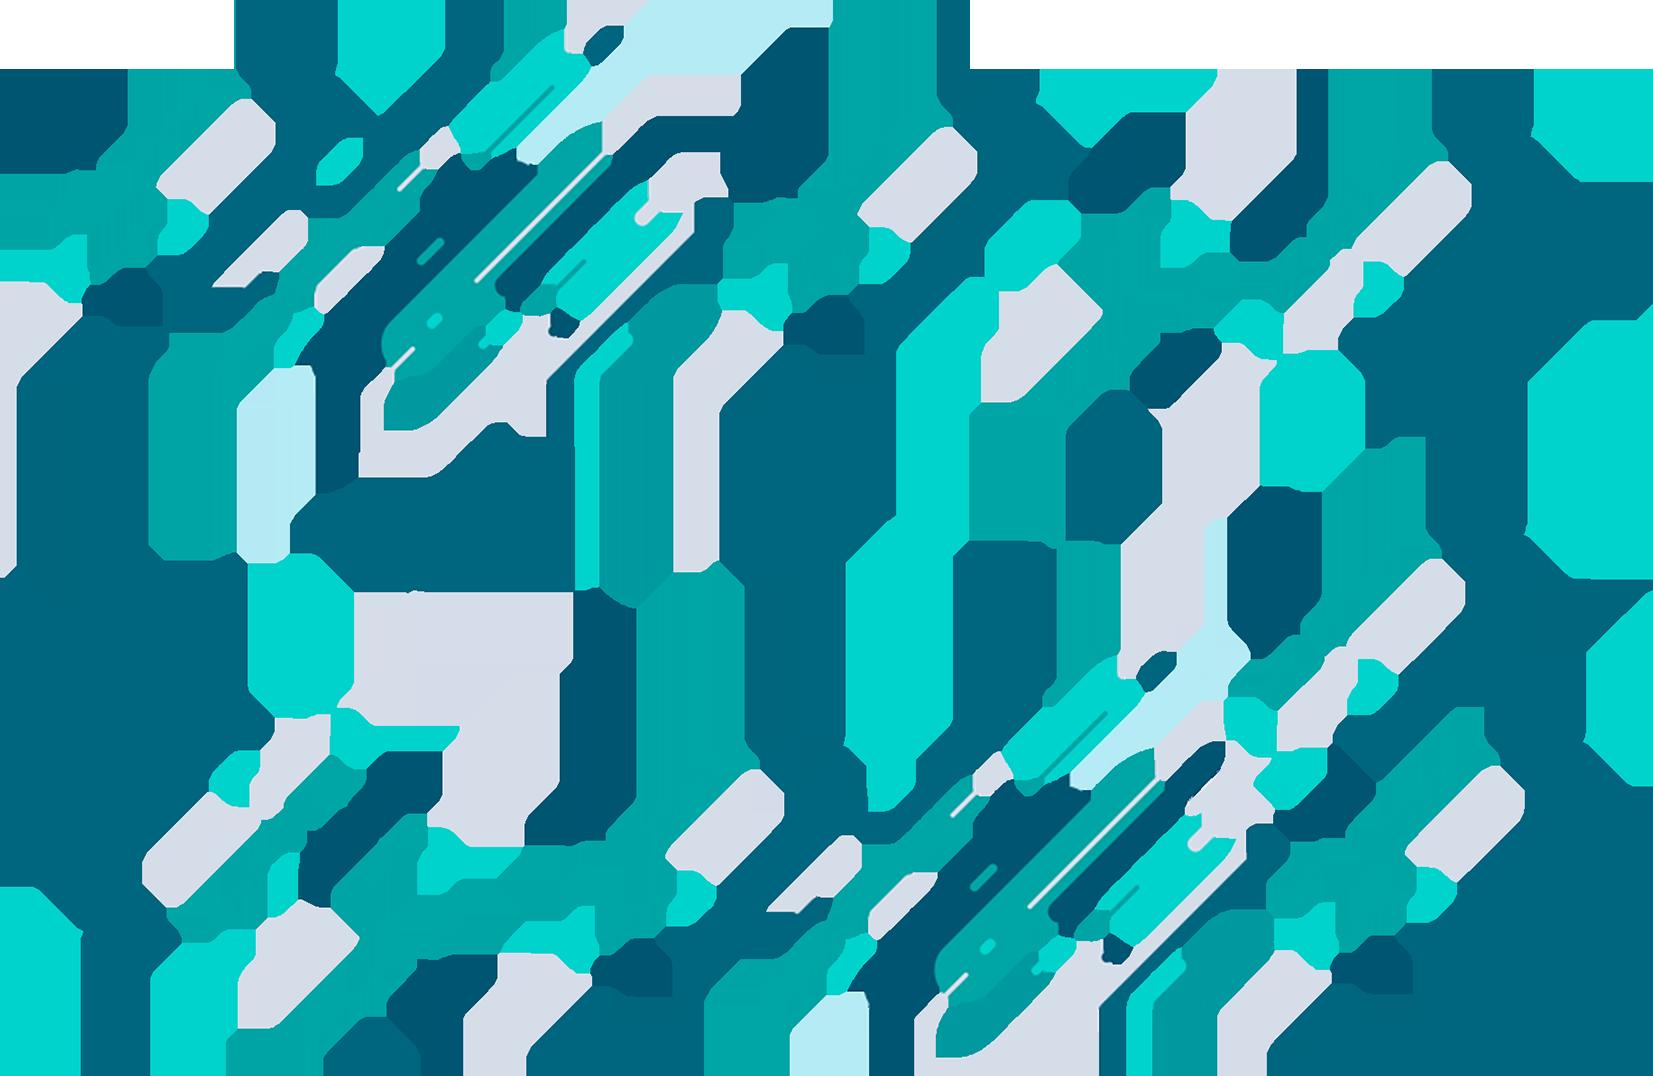 rregular-graphics-with-colorful-fluid